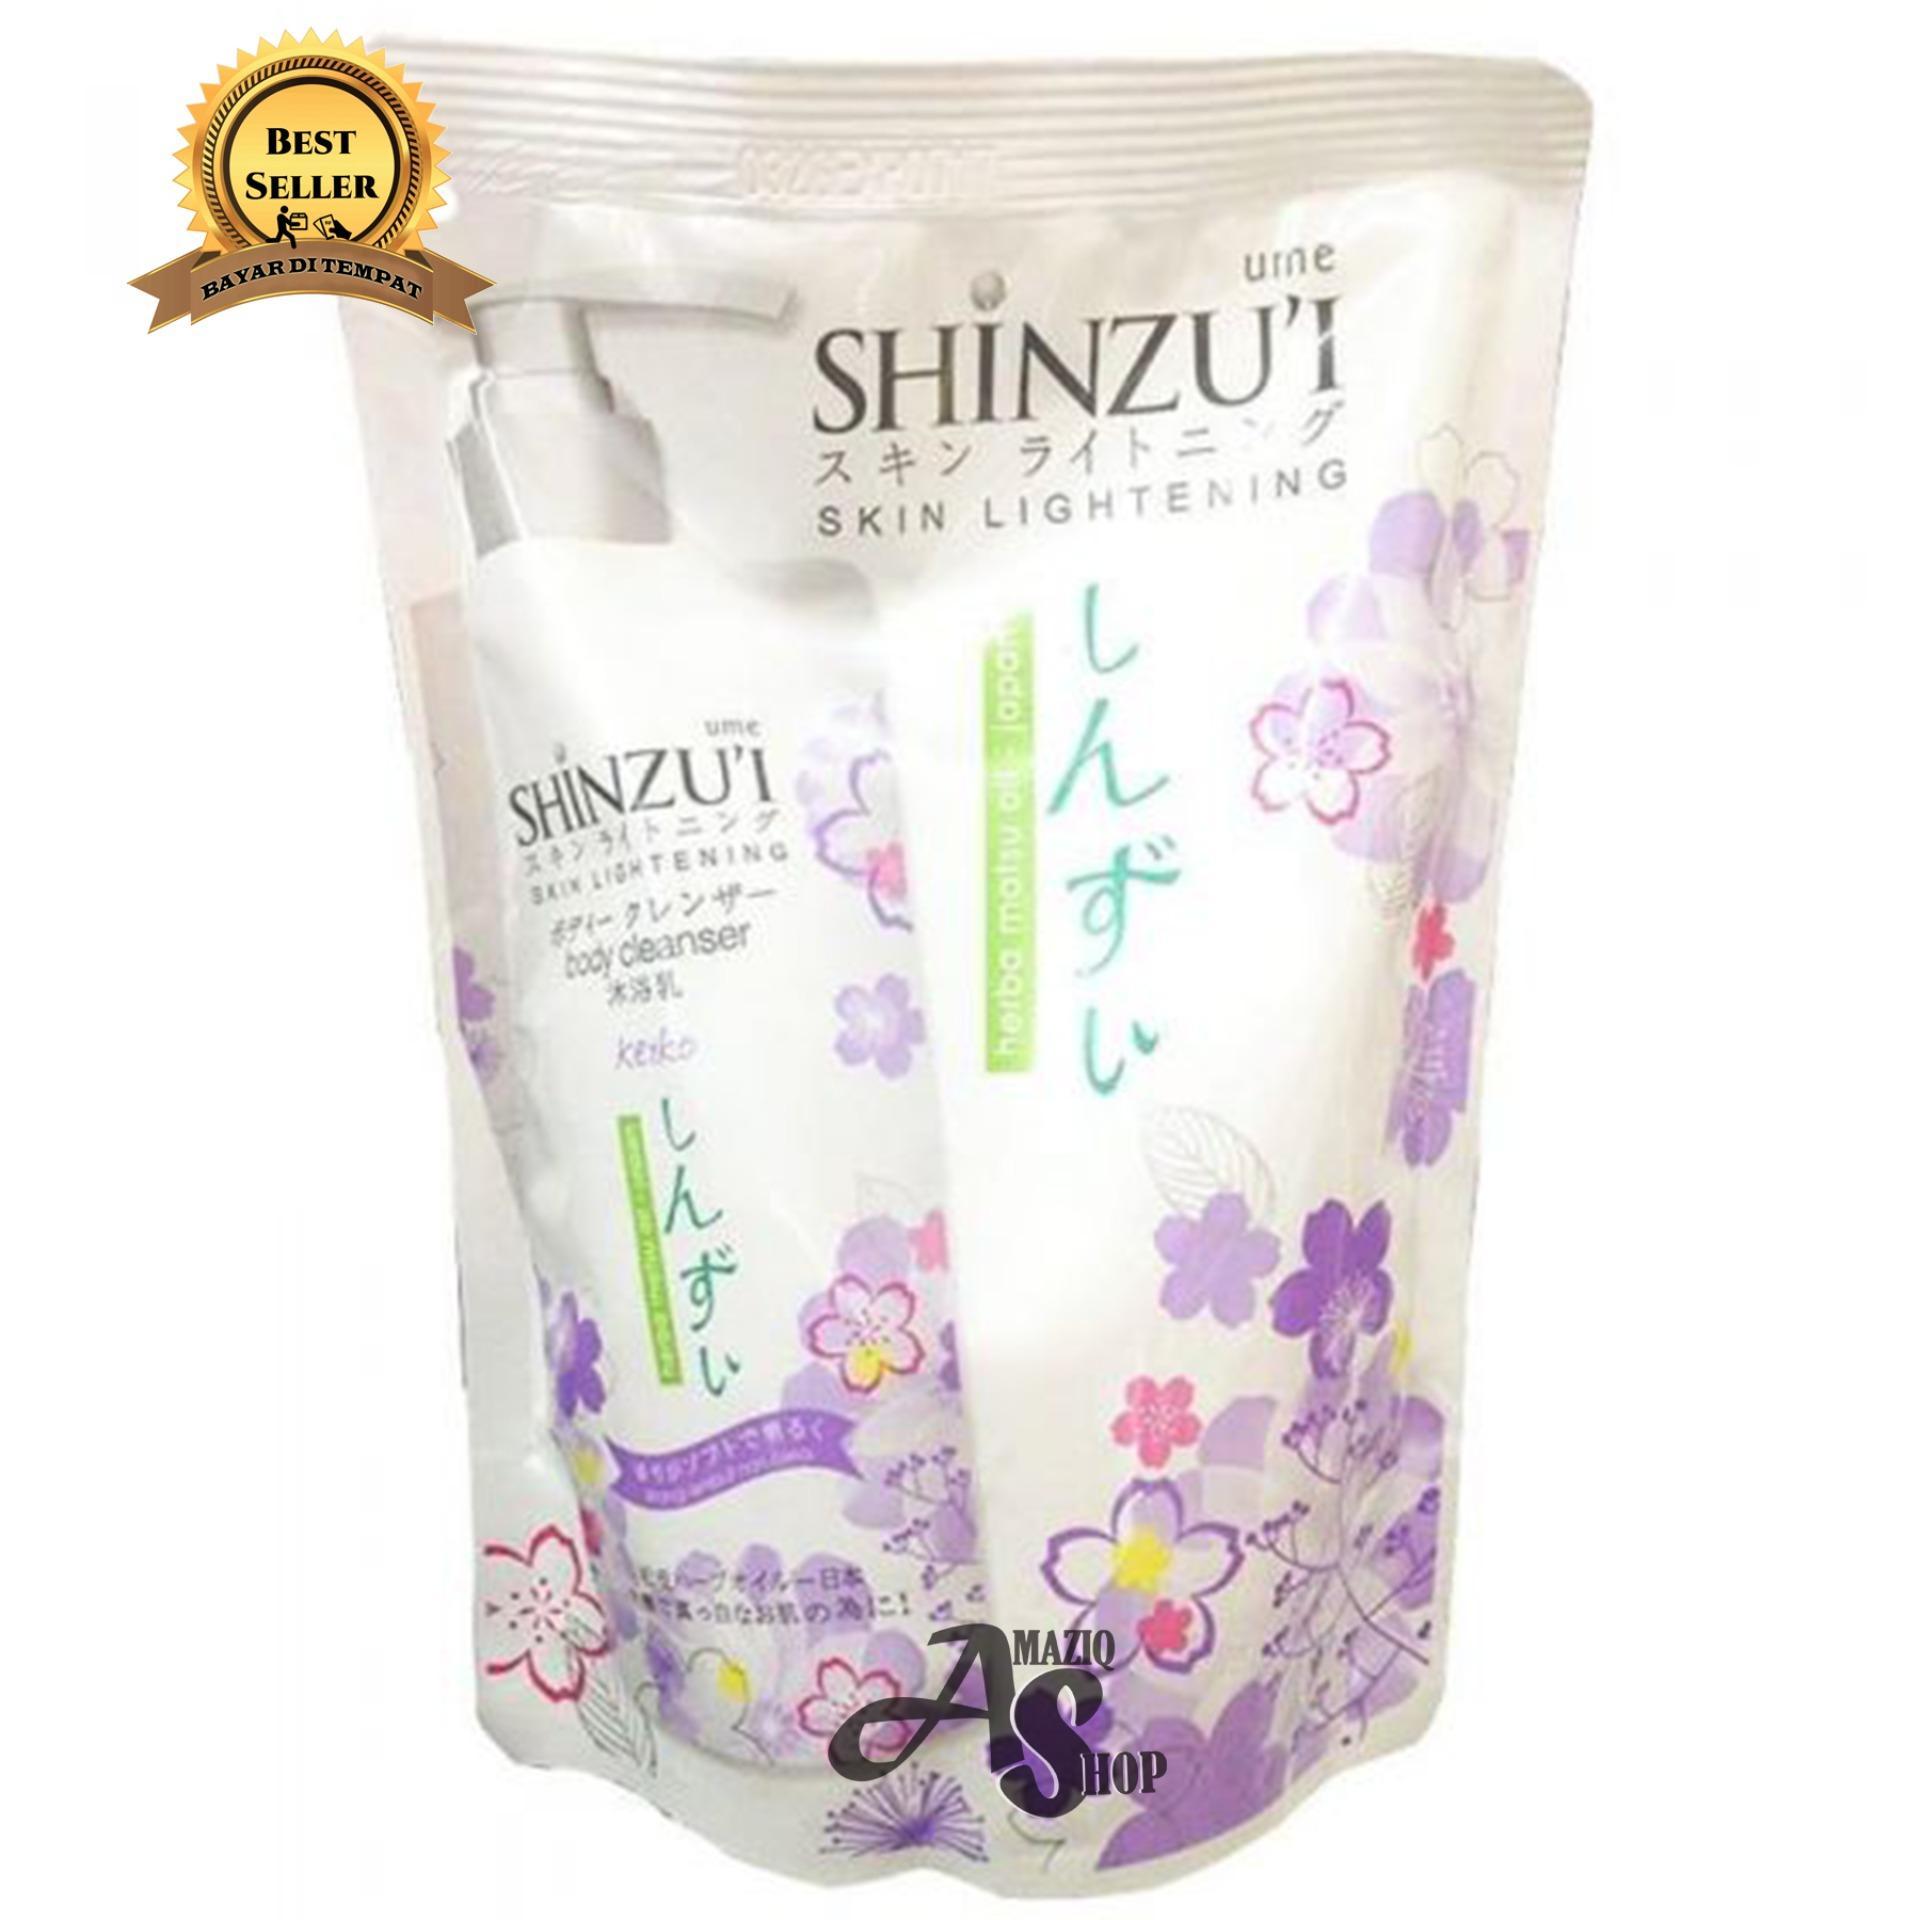 Kehebatan Pure Baby Bath Wash Freshy Refill 450 Ml Dan Harga Update Buy 1 Get Free Purebaby Shampoo 450ml Shinzui Body Sabun Cair Isi